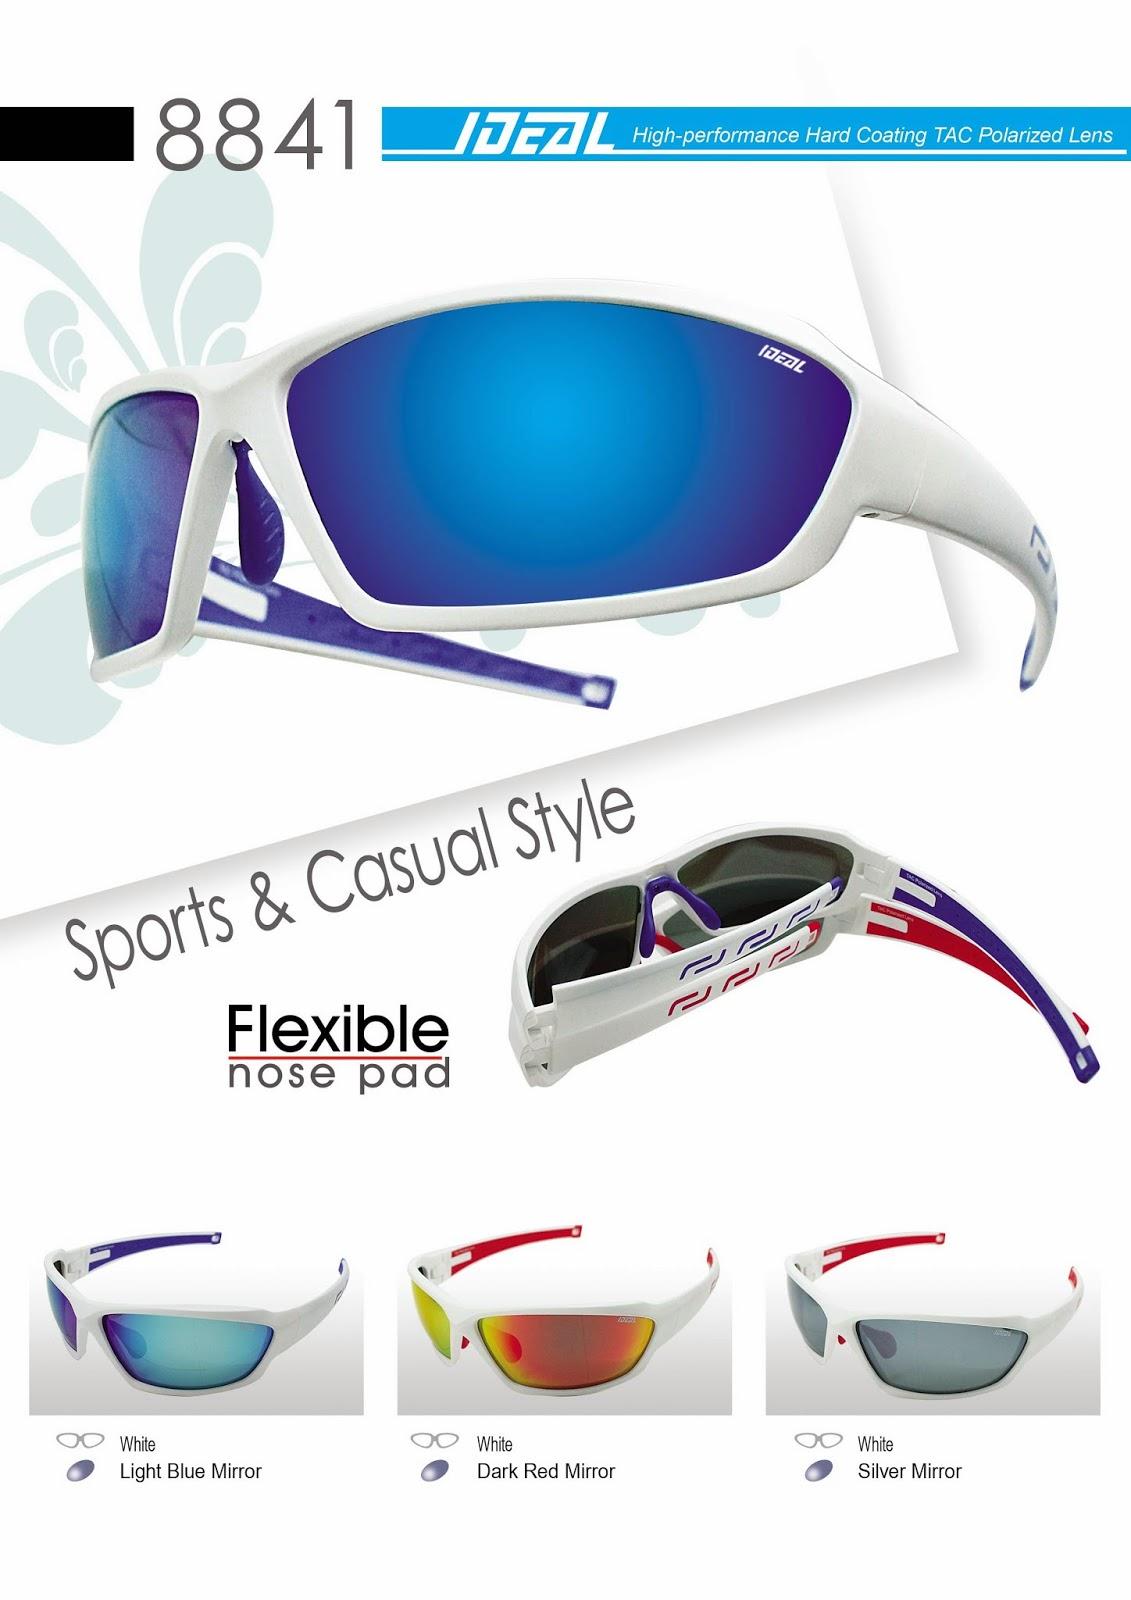 3b4ec8a63da2 Ideal Polarized Sunglasses  8841